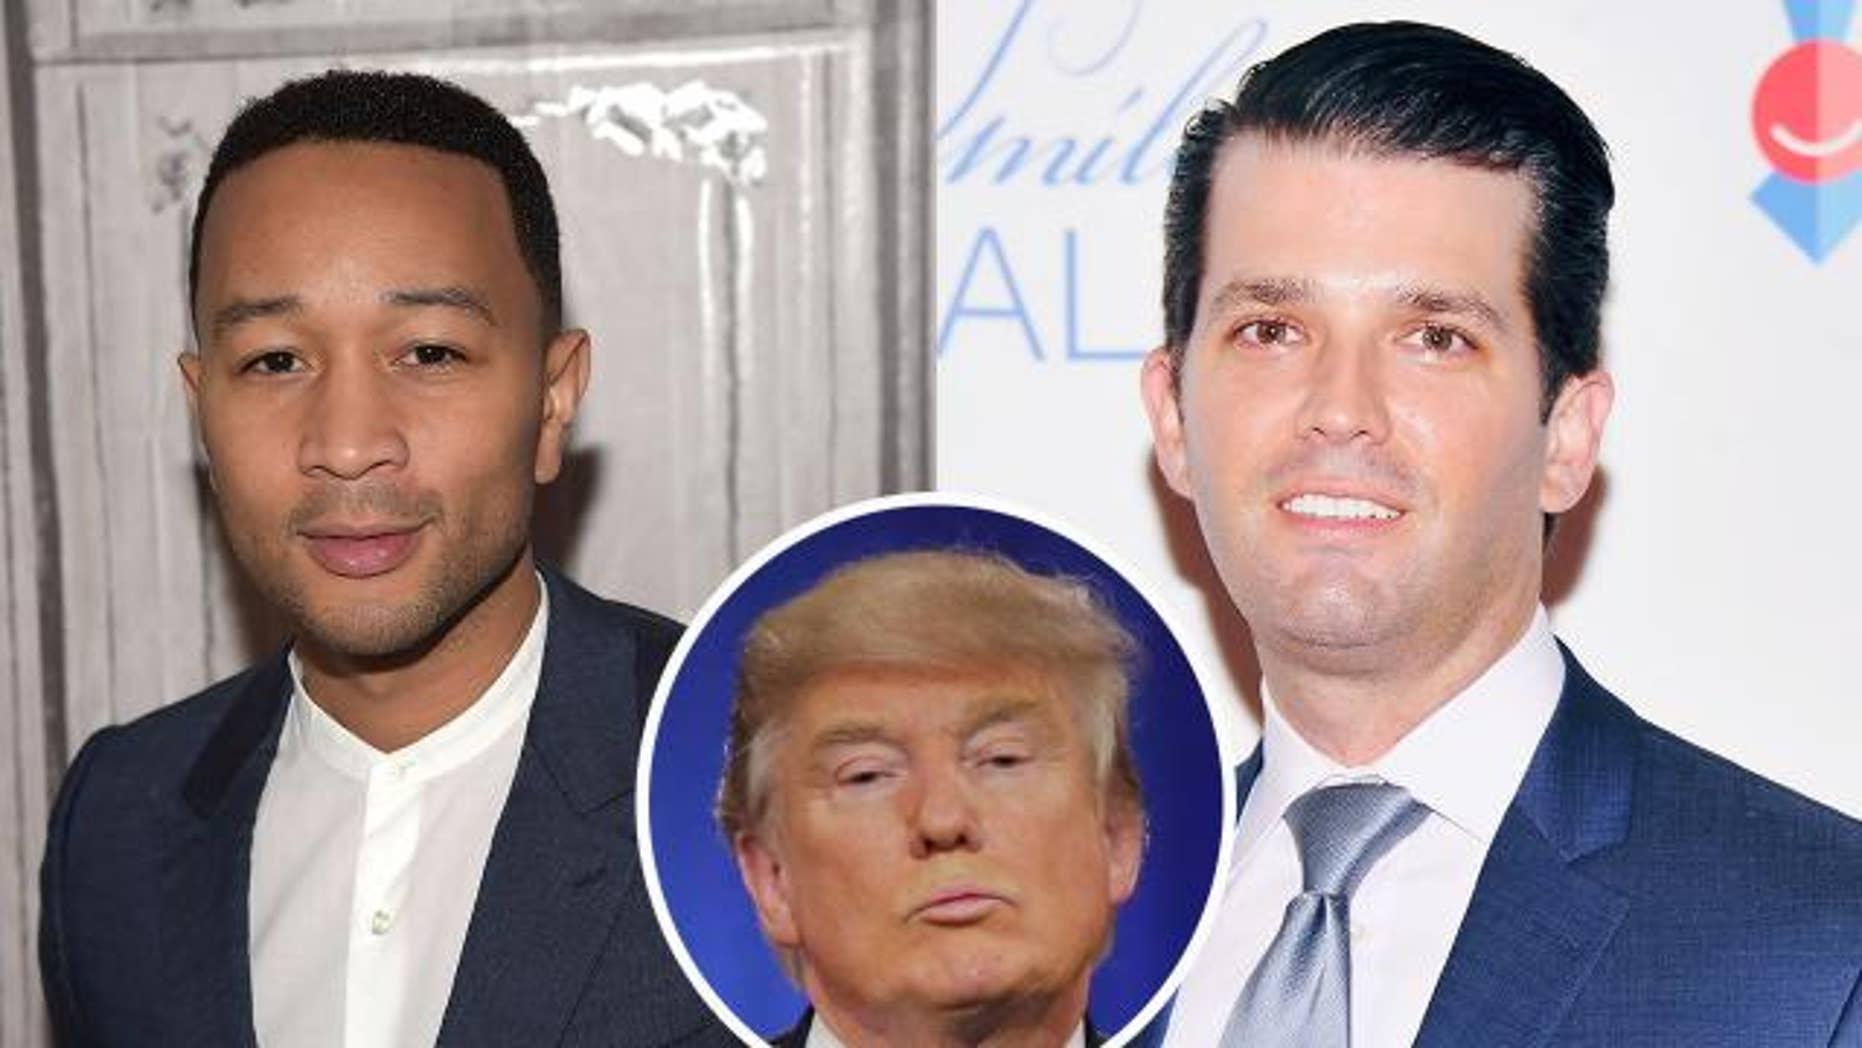 John Legend, Donald Trump Jr, and an inset of Donald Trump.